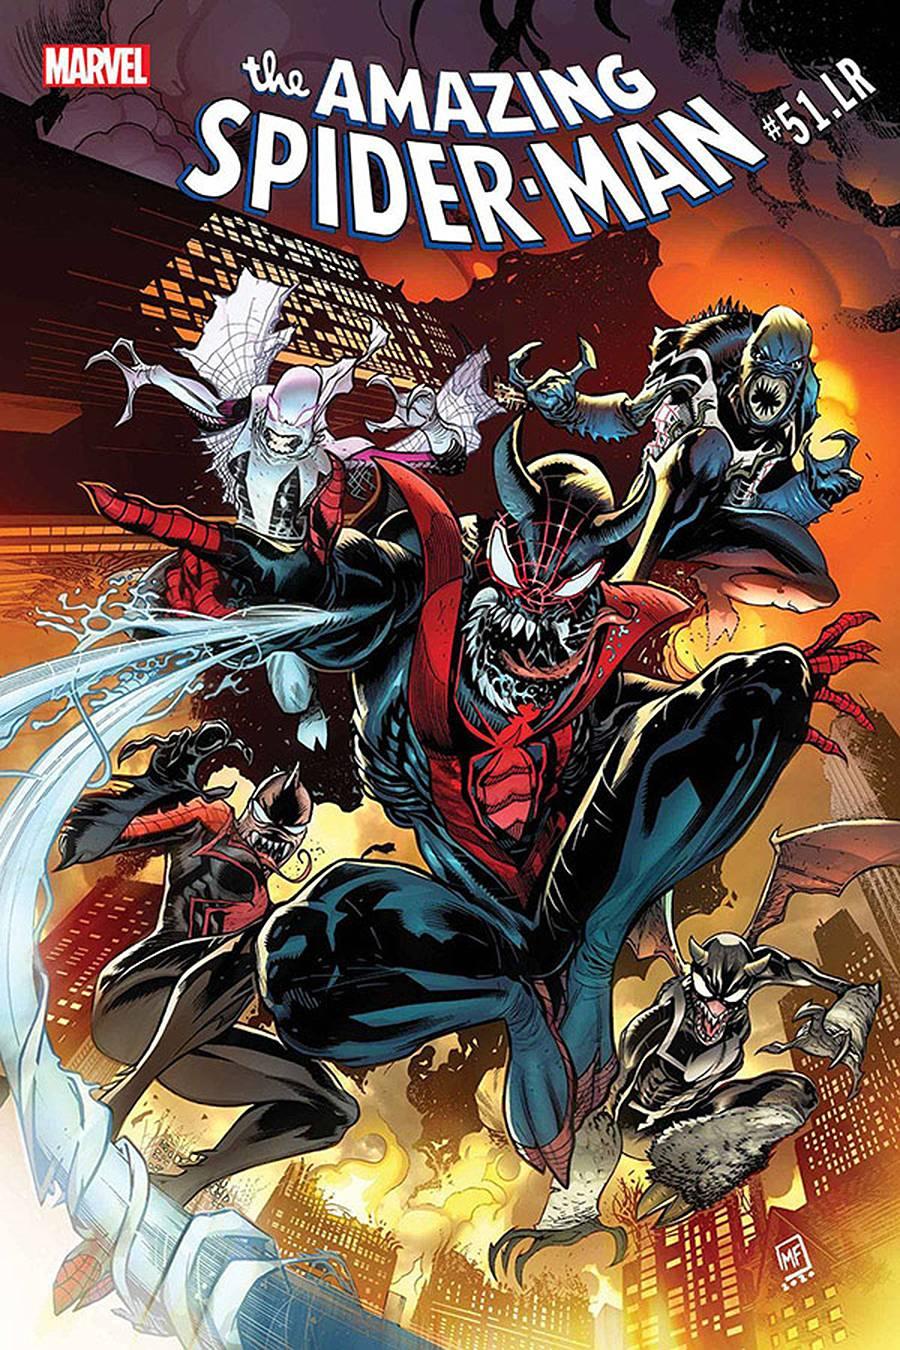 AMAZING SPIDER-MAN #51.LR ROSENBERG SGN